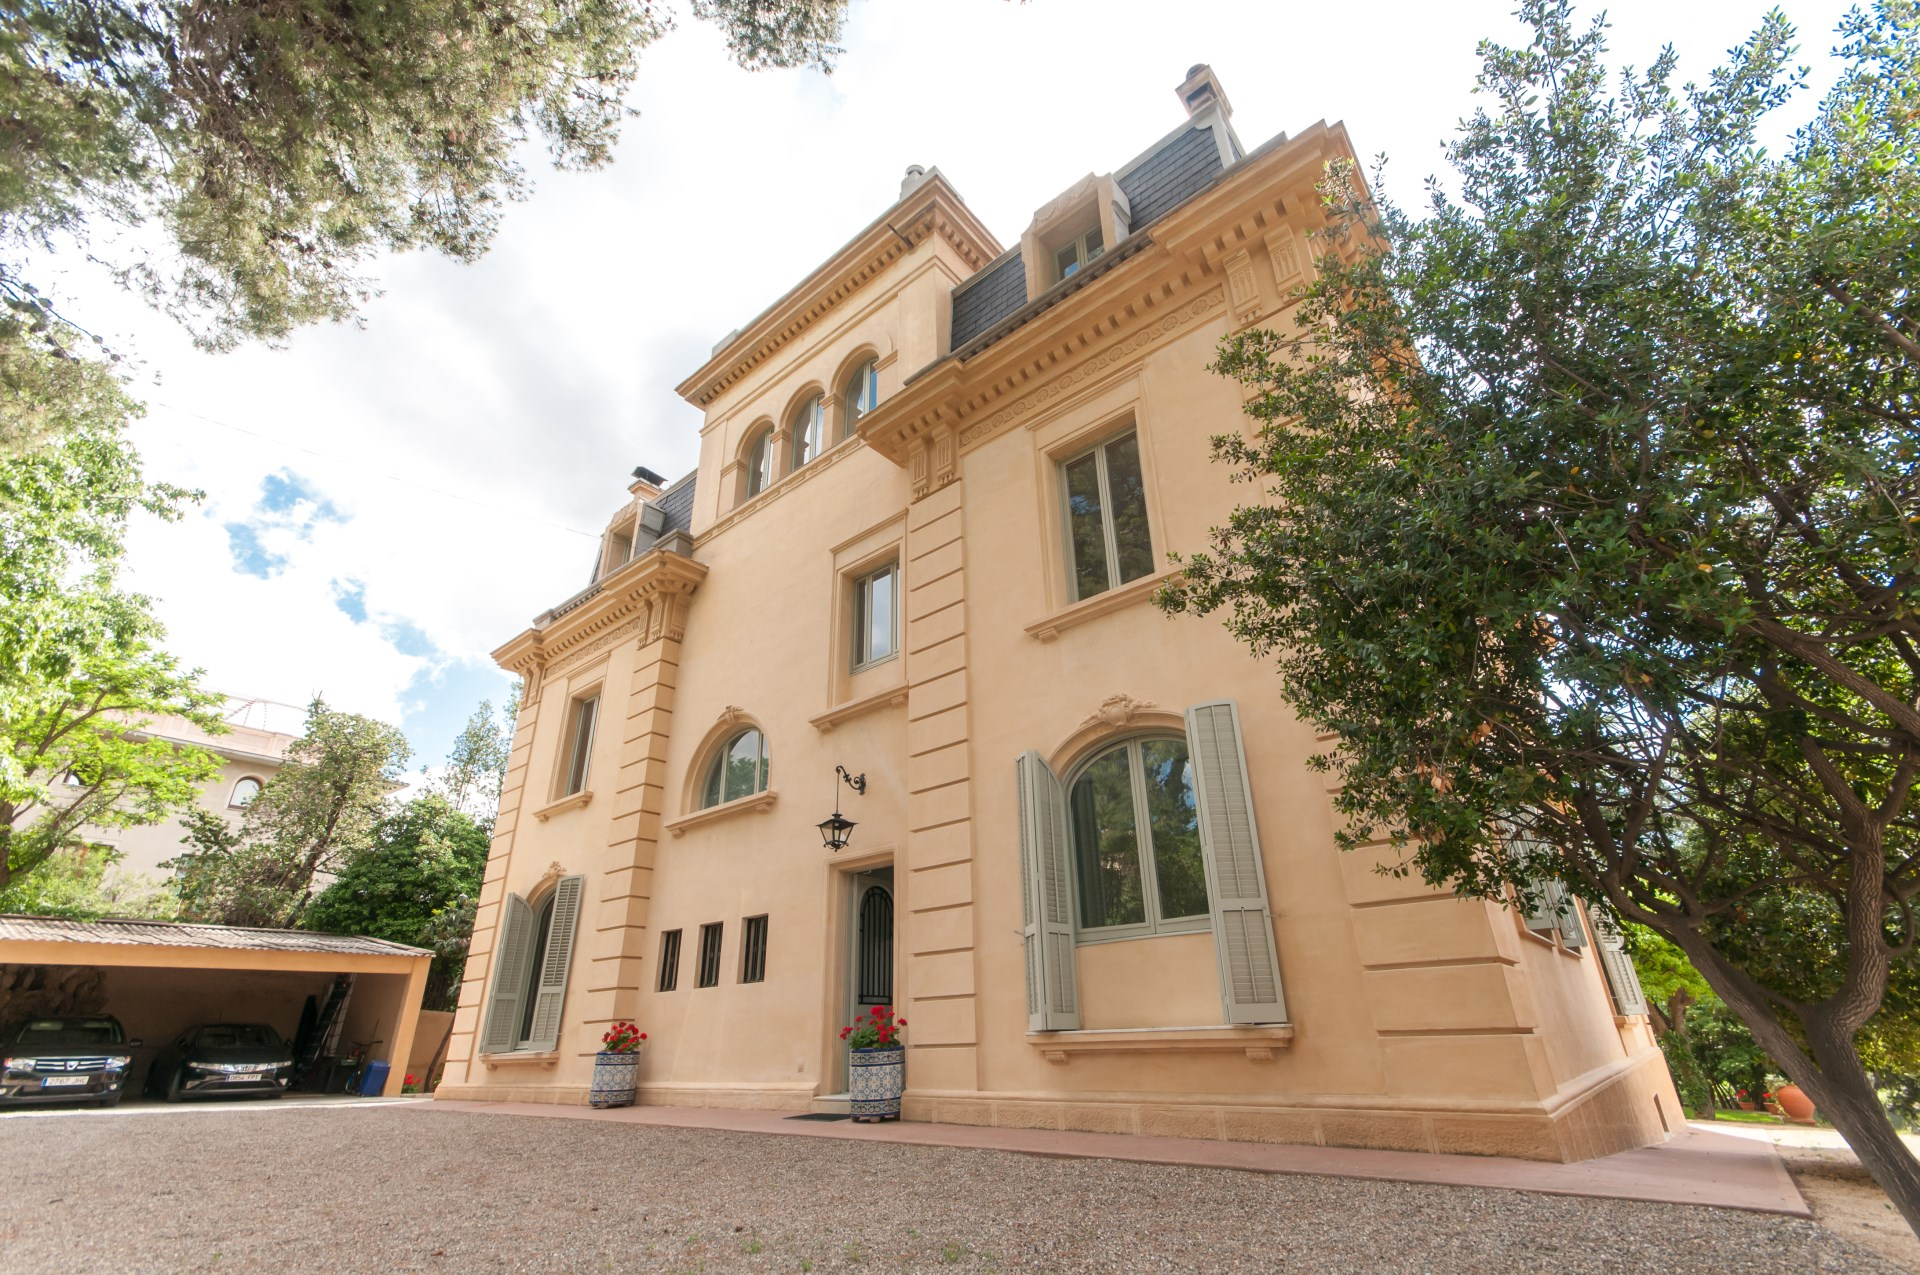 Casas de lujo en alquiler en sant gervasi for Casas con piscina barcelona alquiler